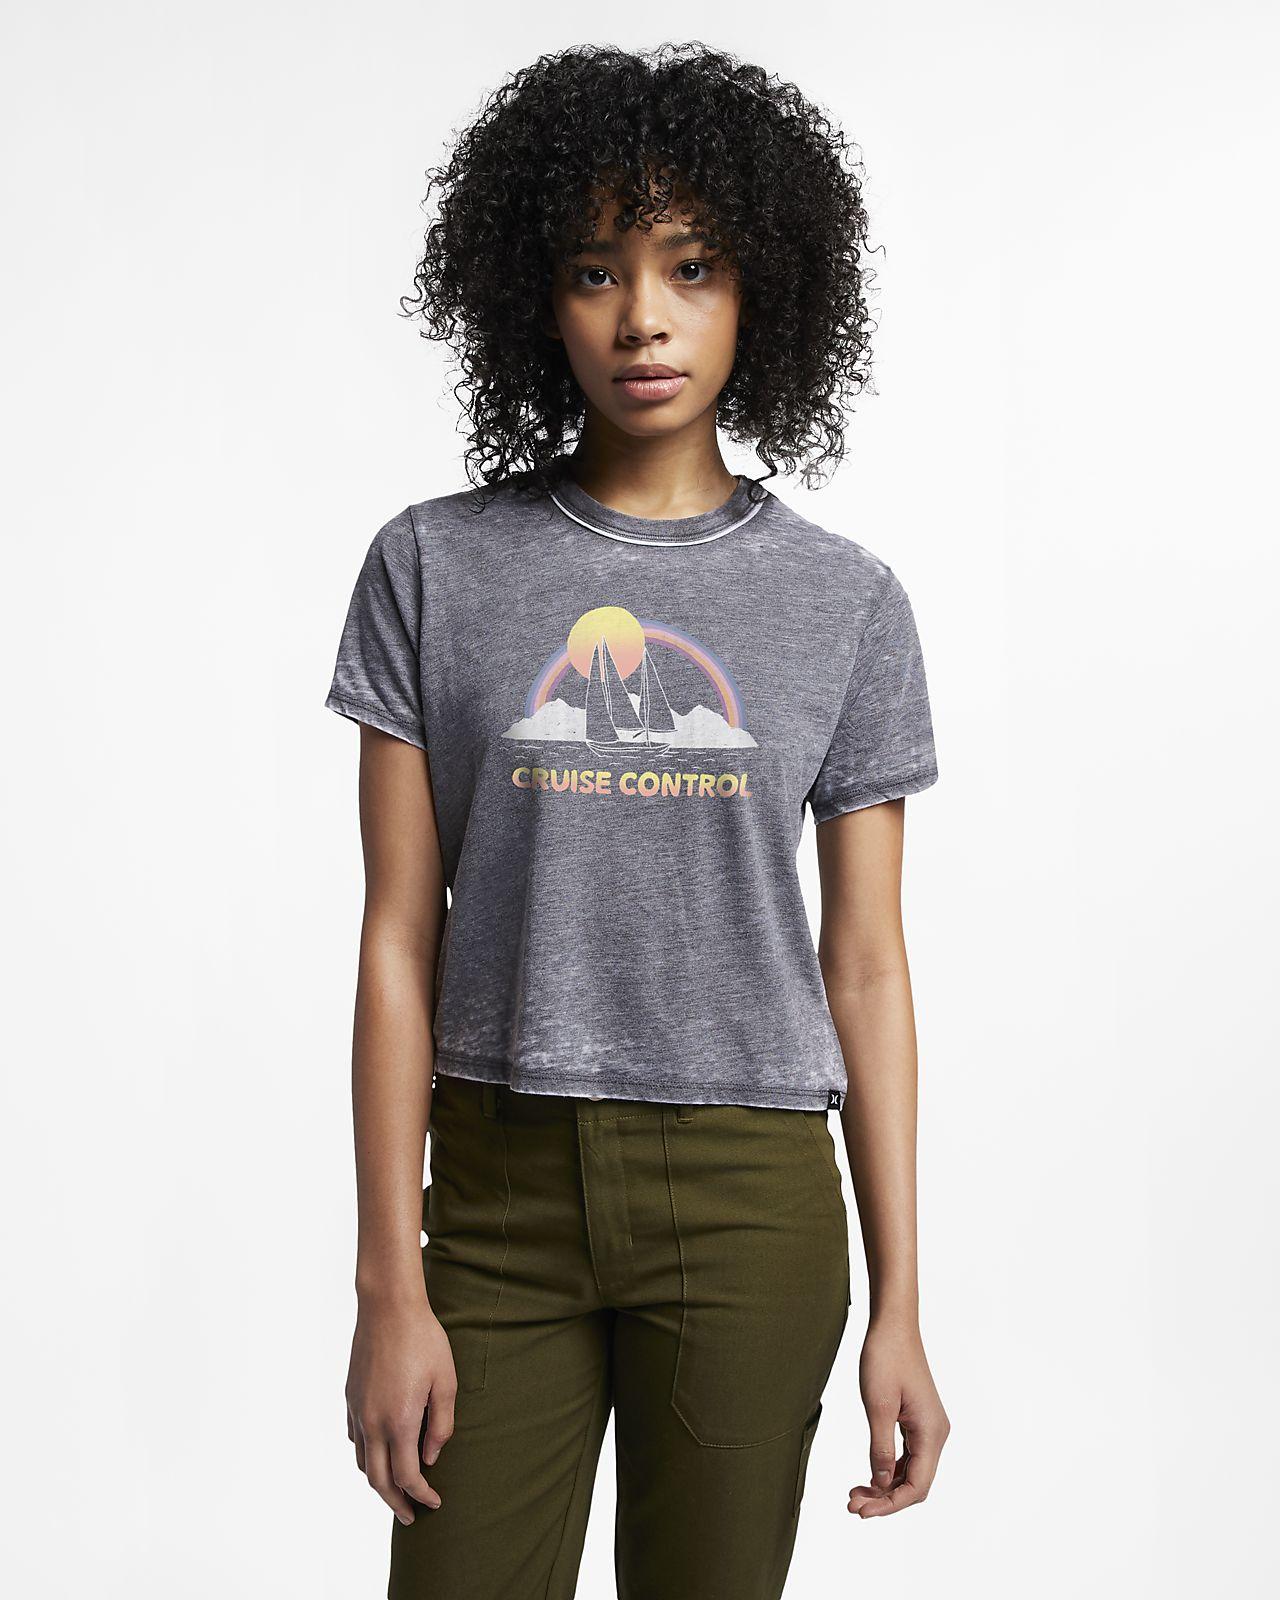 Hurley Cruise Control T-shirt voor dames